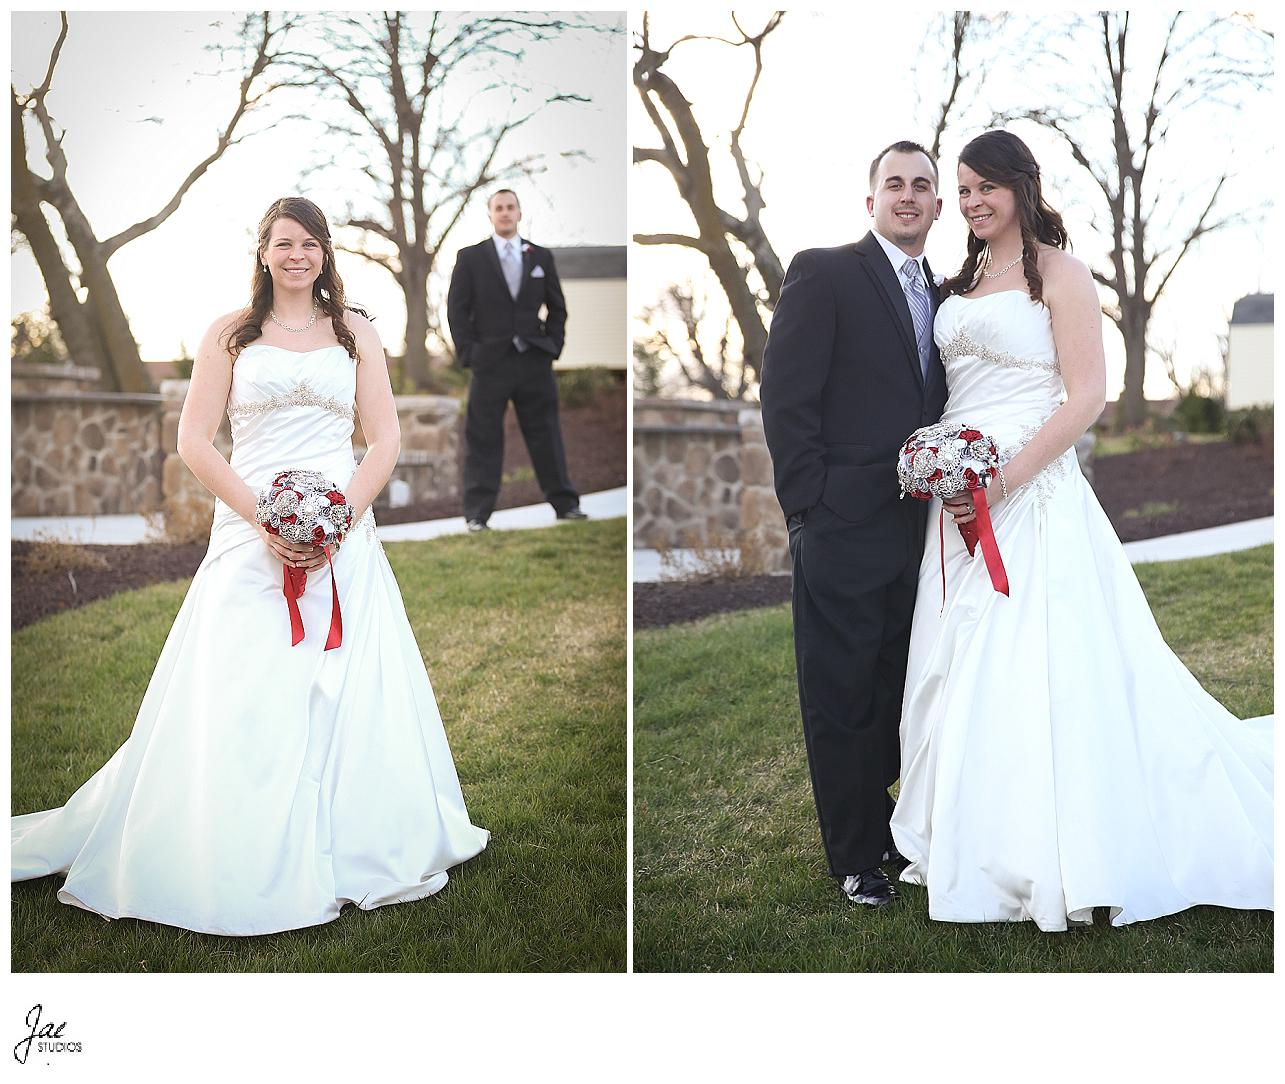 Josh & Kari - A Sparkly Spring